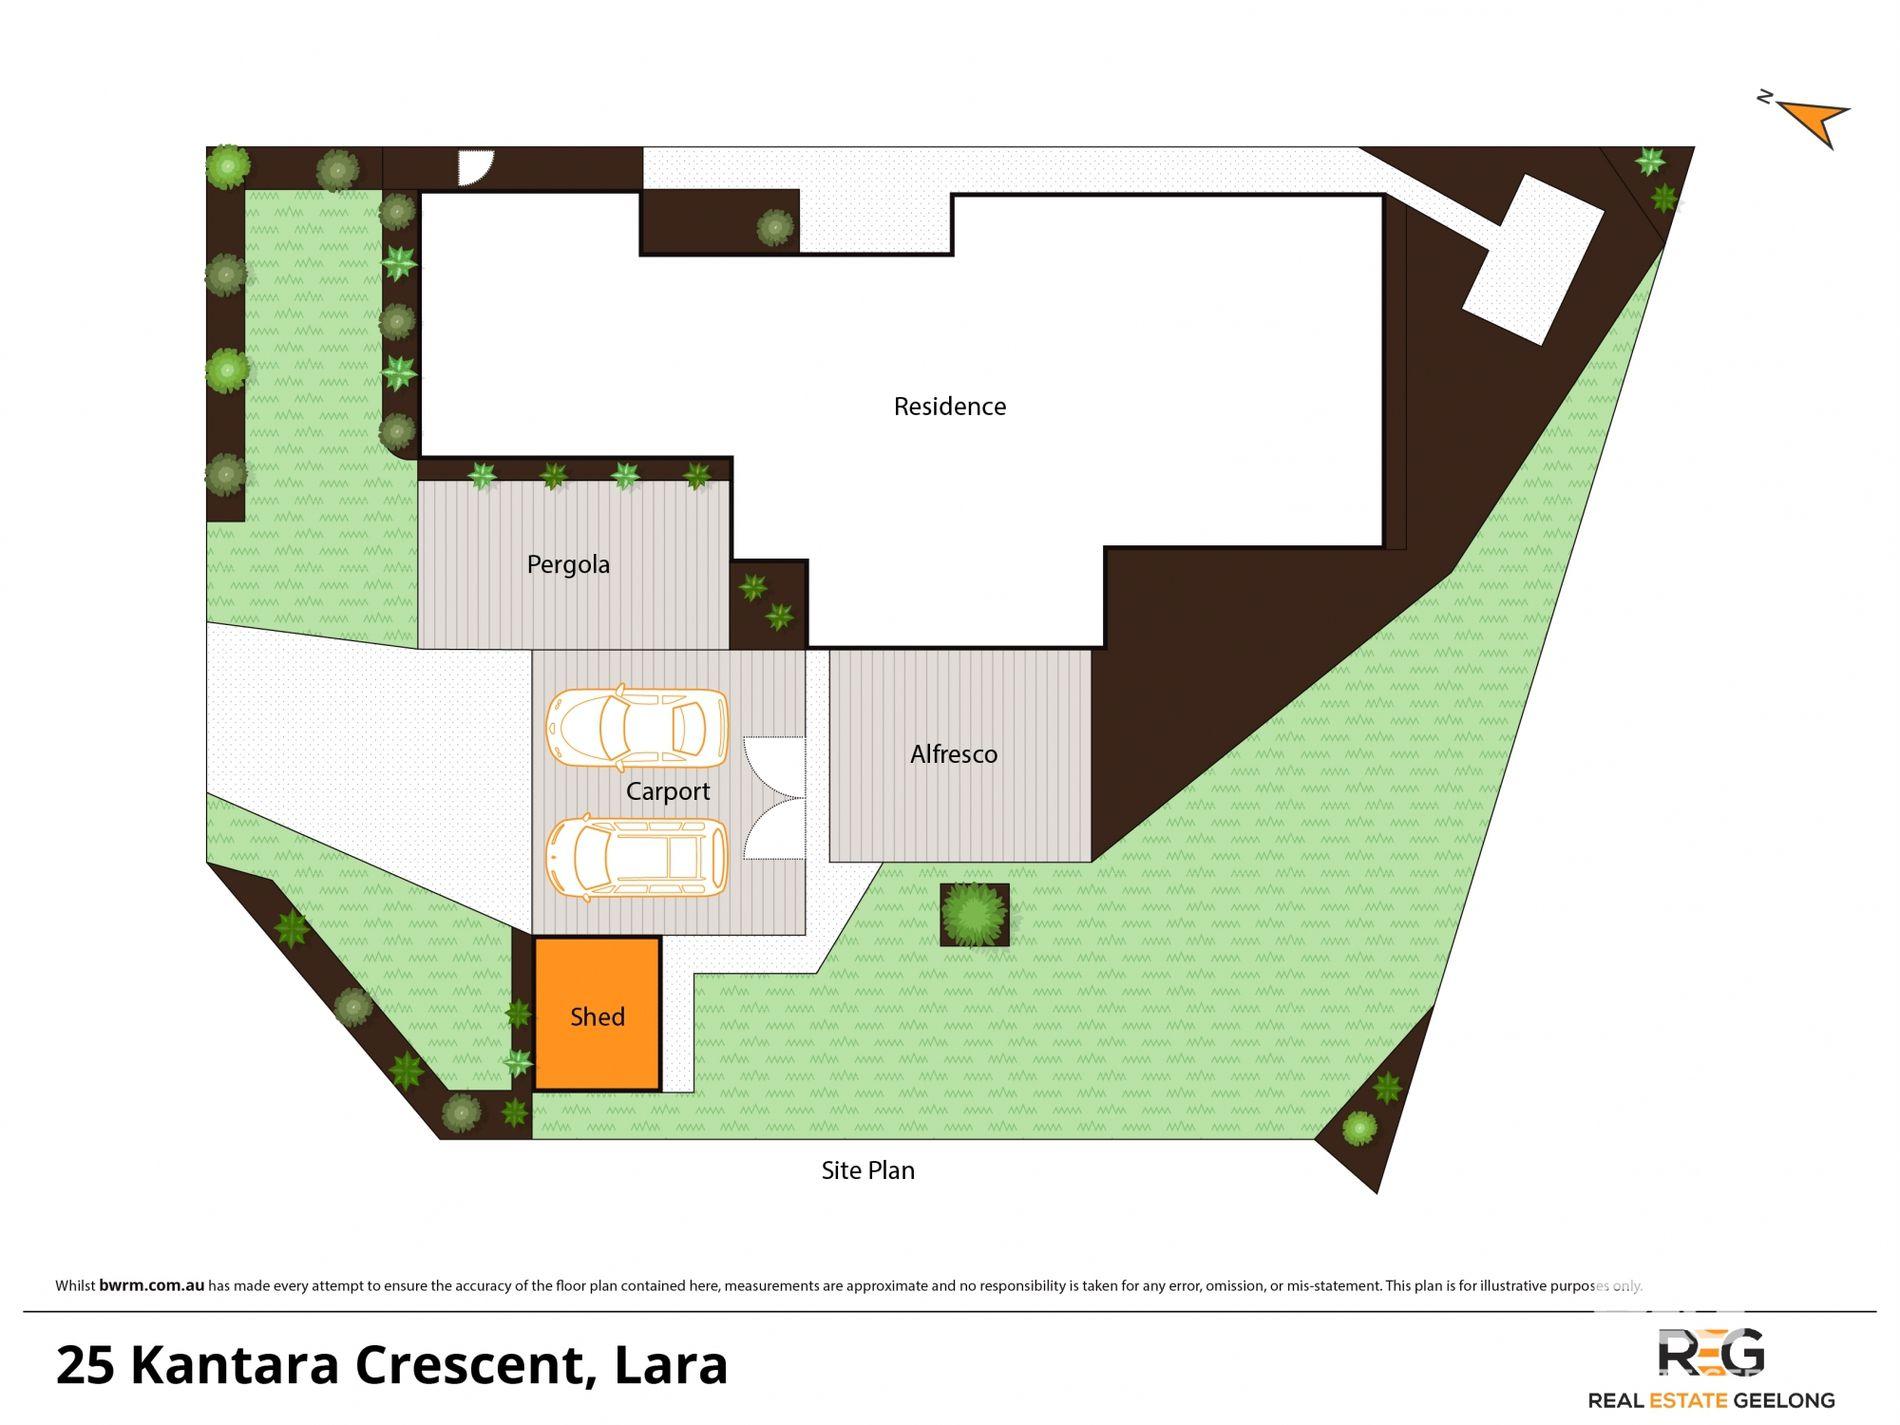 25 Kantara Crescent, Lara